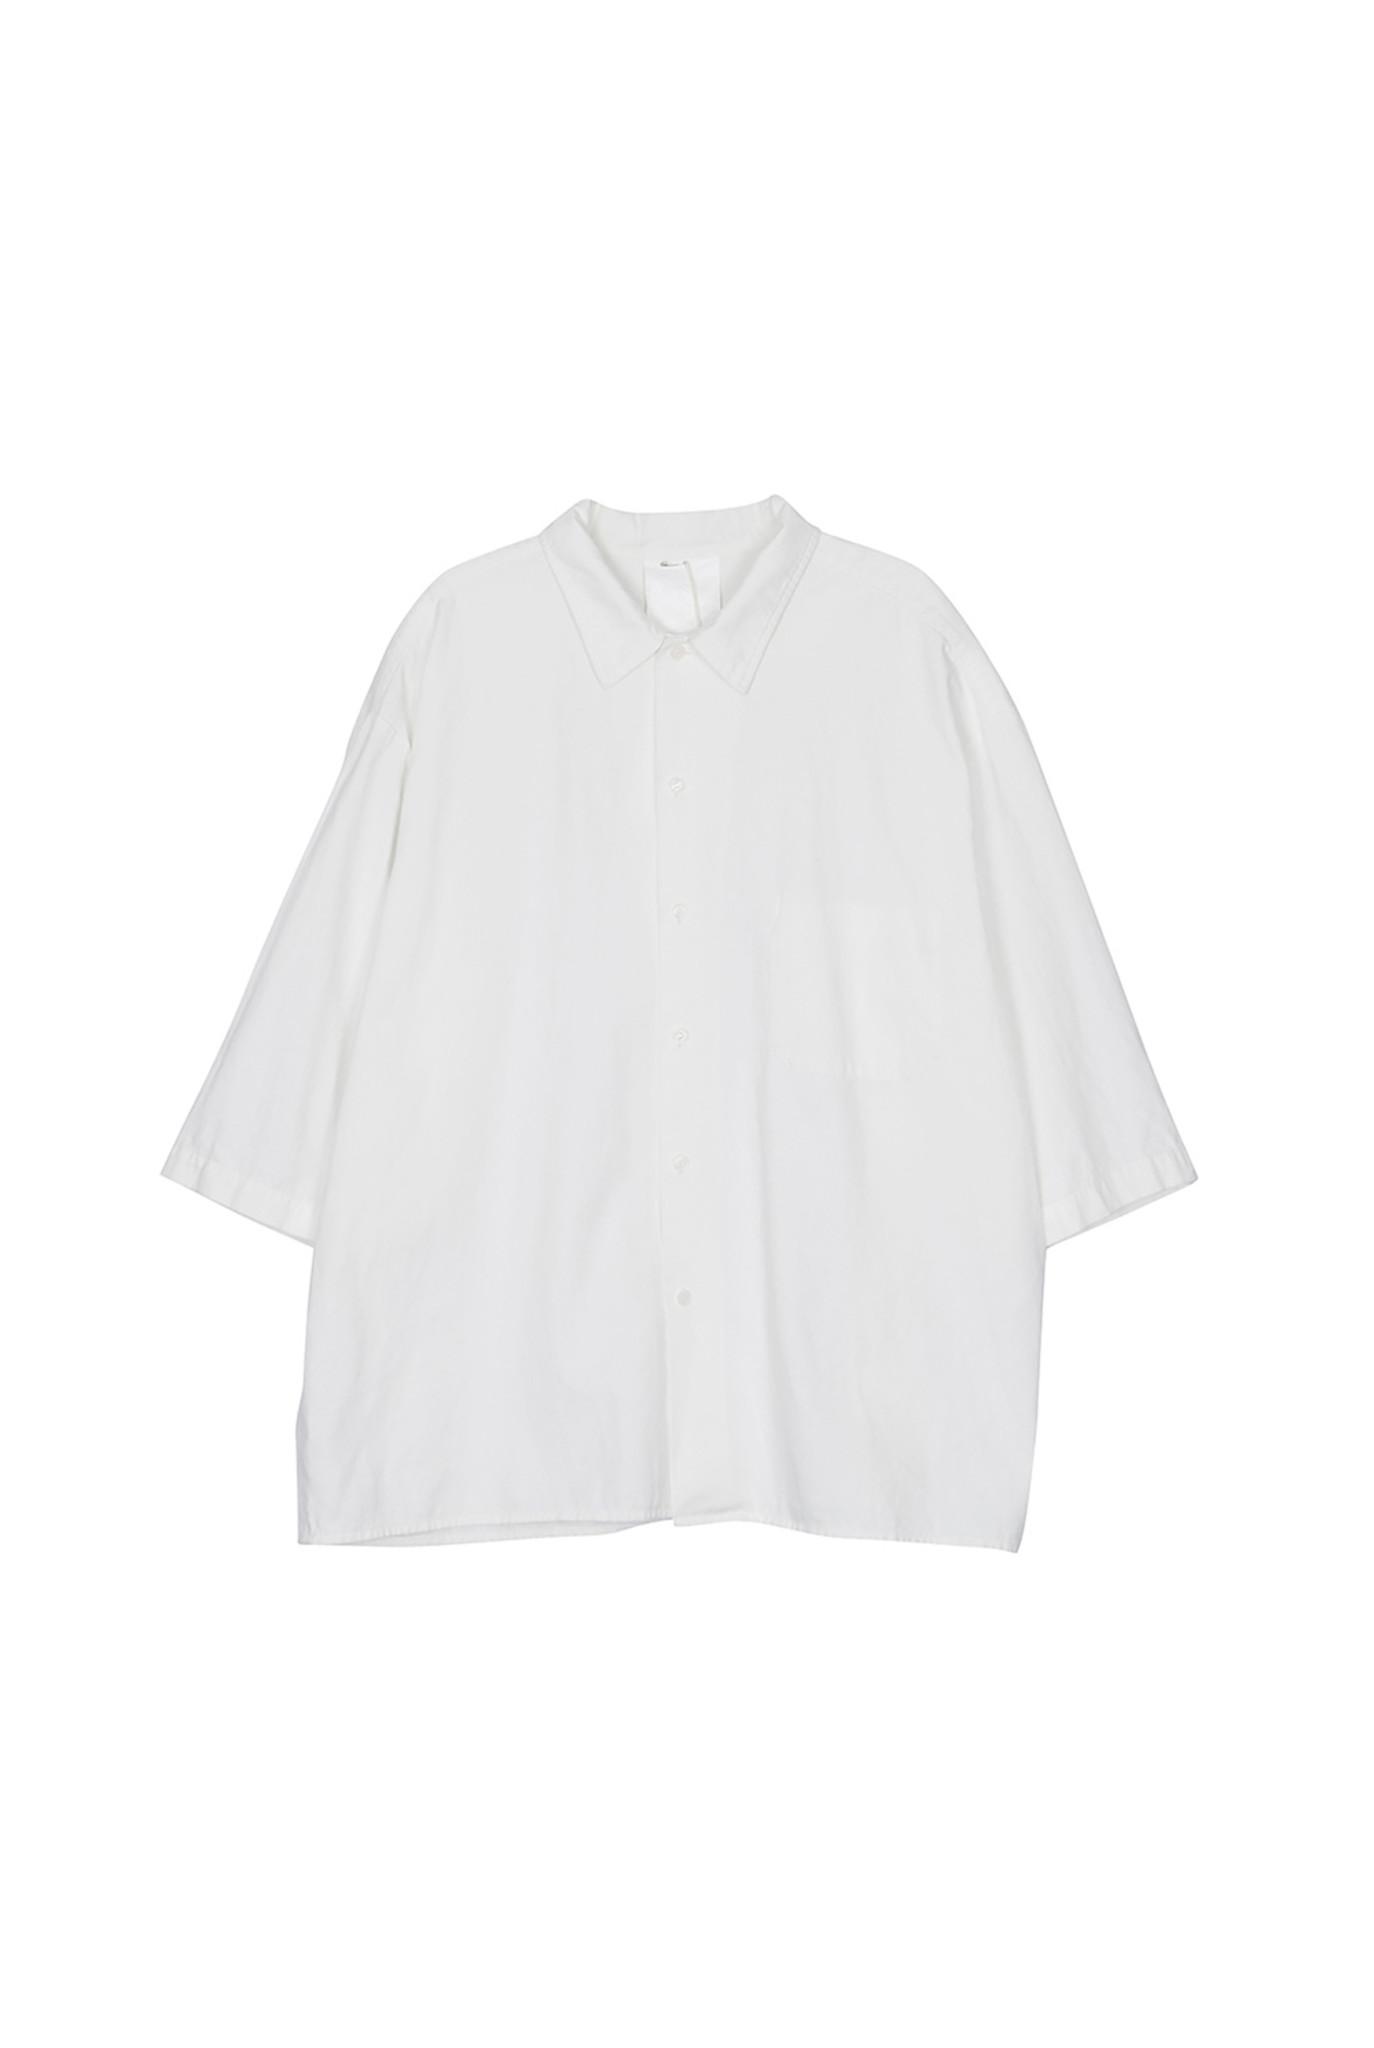 Short sleeve cotton shirt white